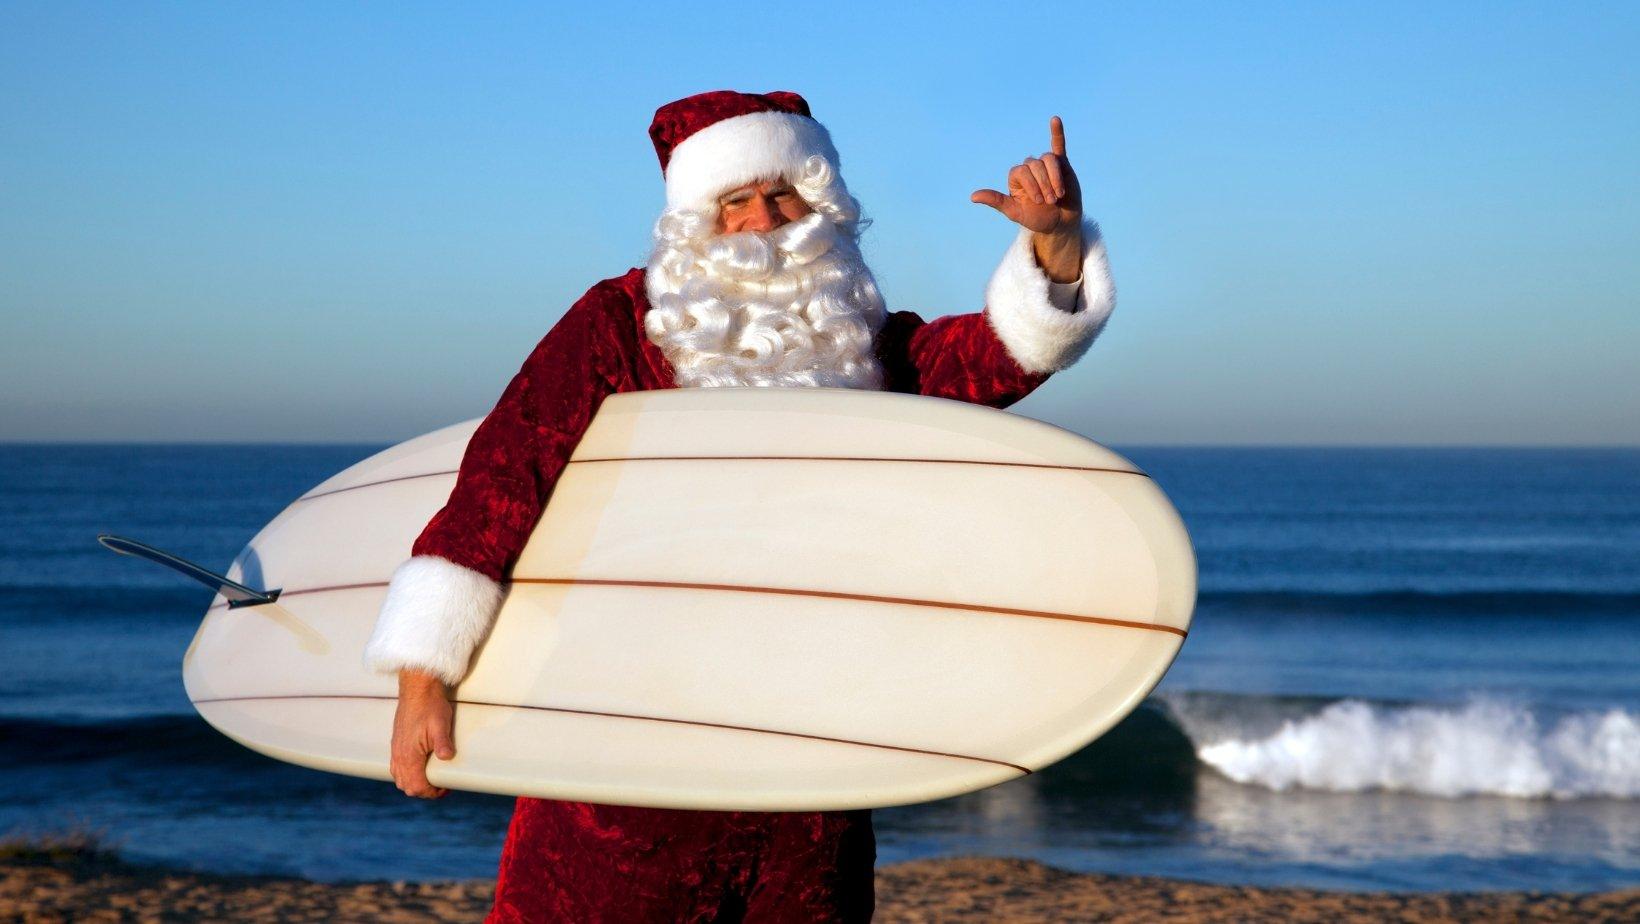 Santa on the beach, New South Wales, Australia